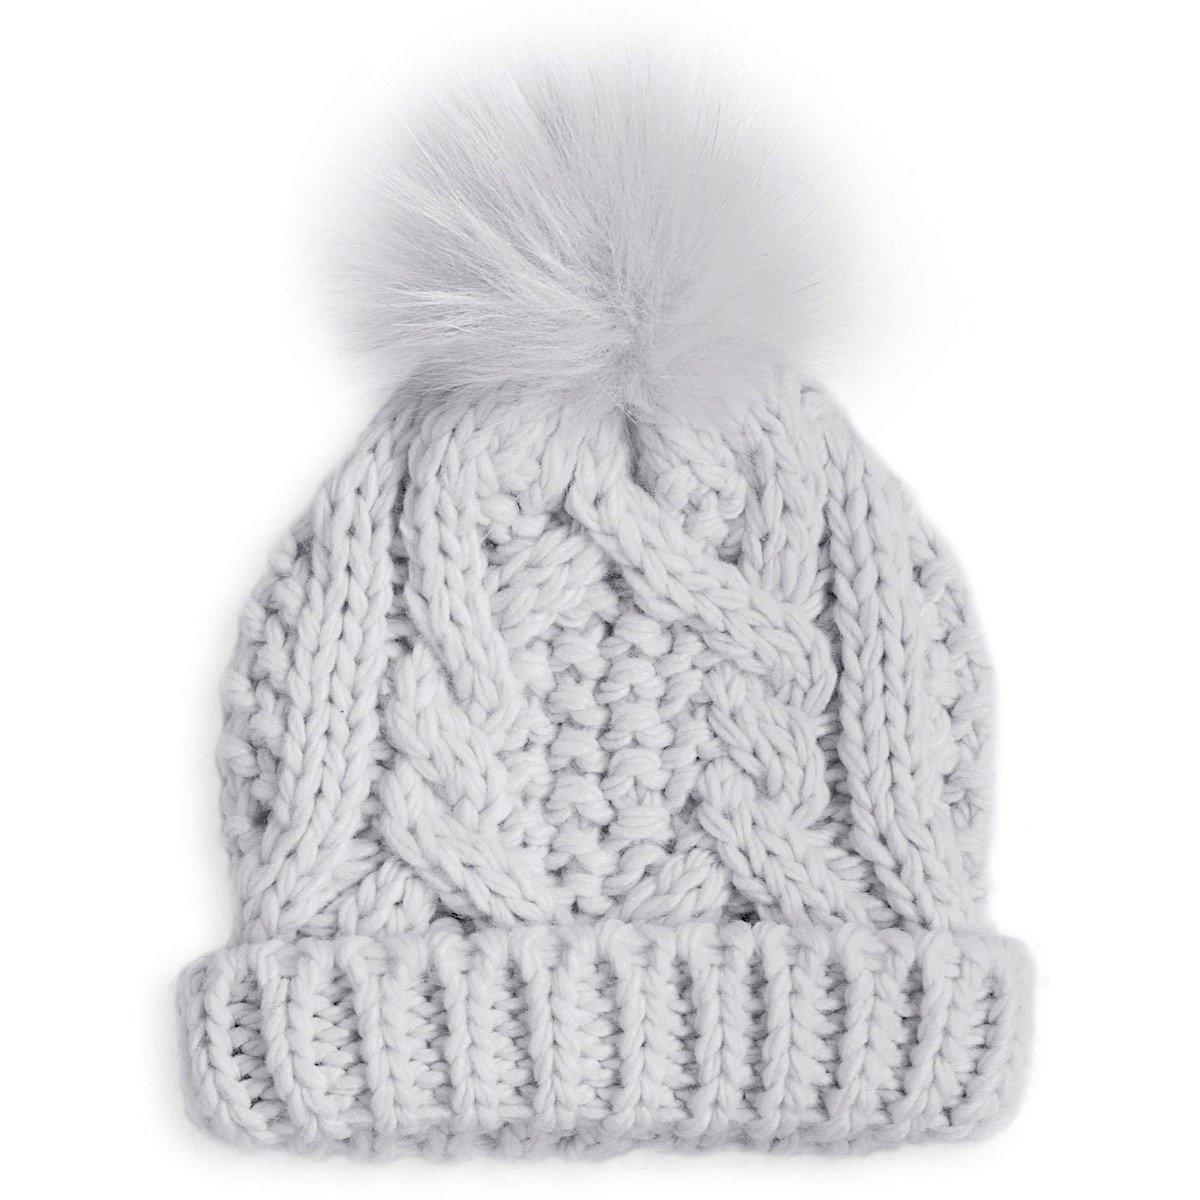 1121465e953 Katie Loxton Baby Cable Knit Bobble Hat (grey) BA0021 - Lizzielane.com